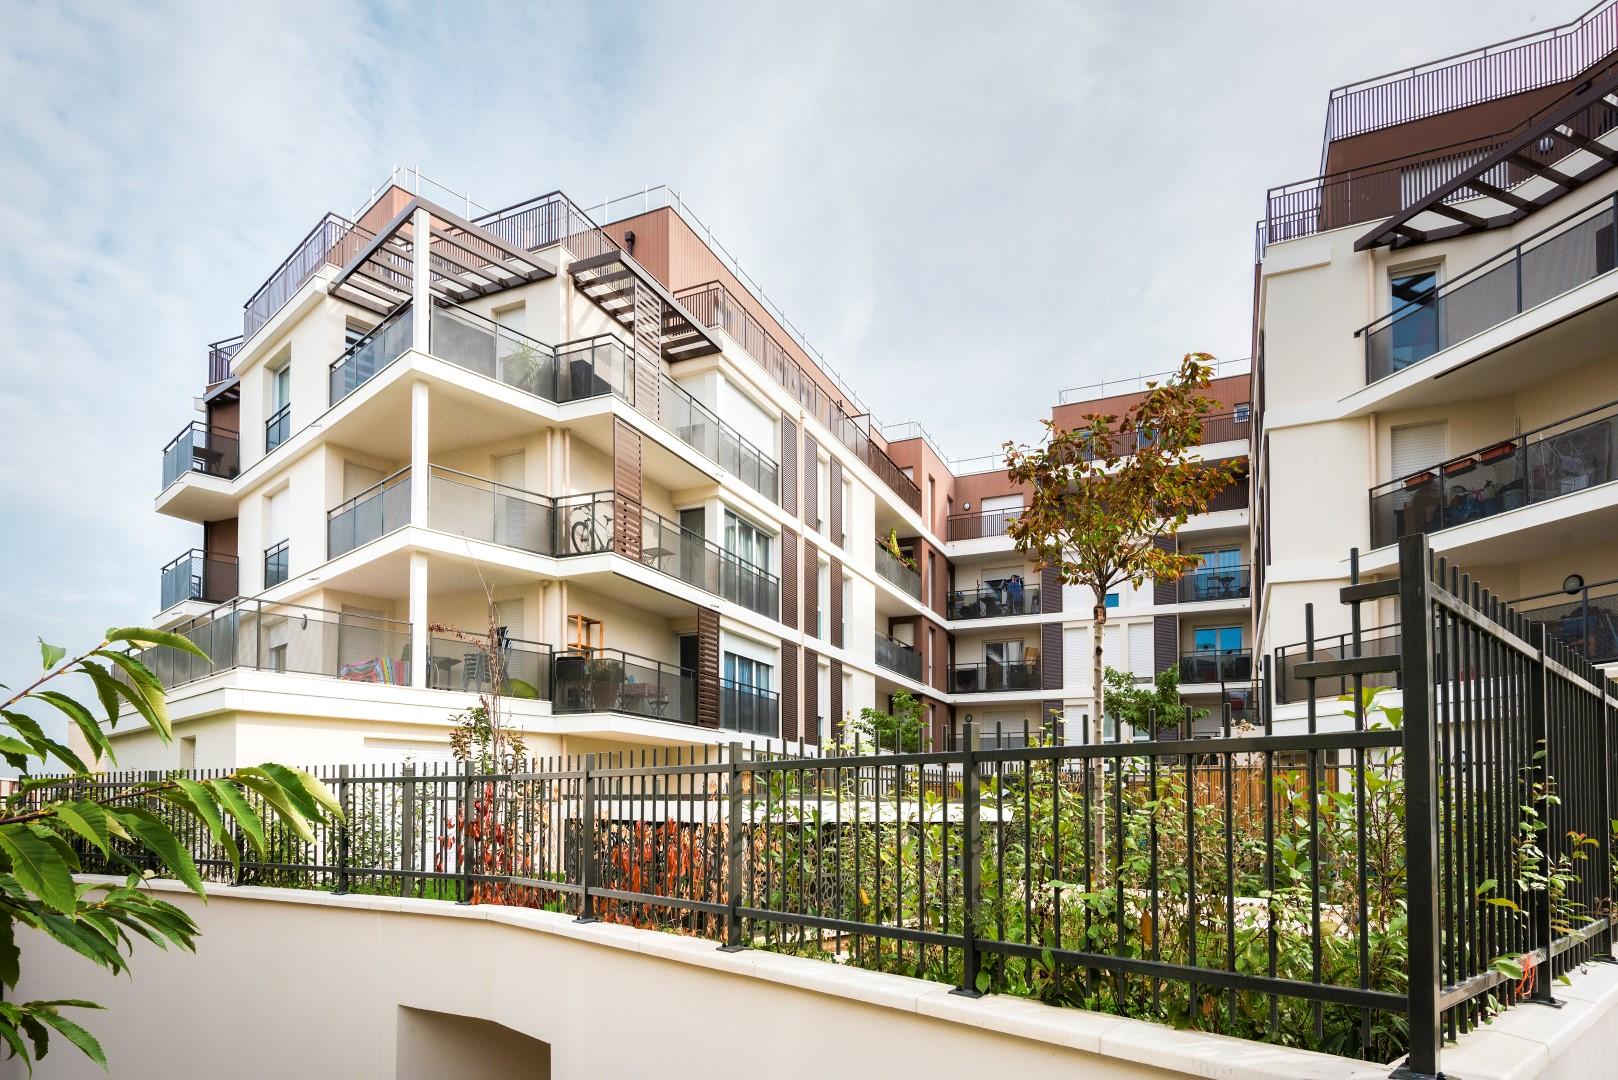 Le Bel Canto - Fontenay le Fleury - Intermediate rental housing